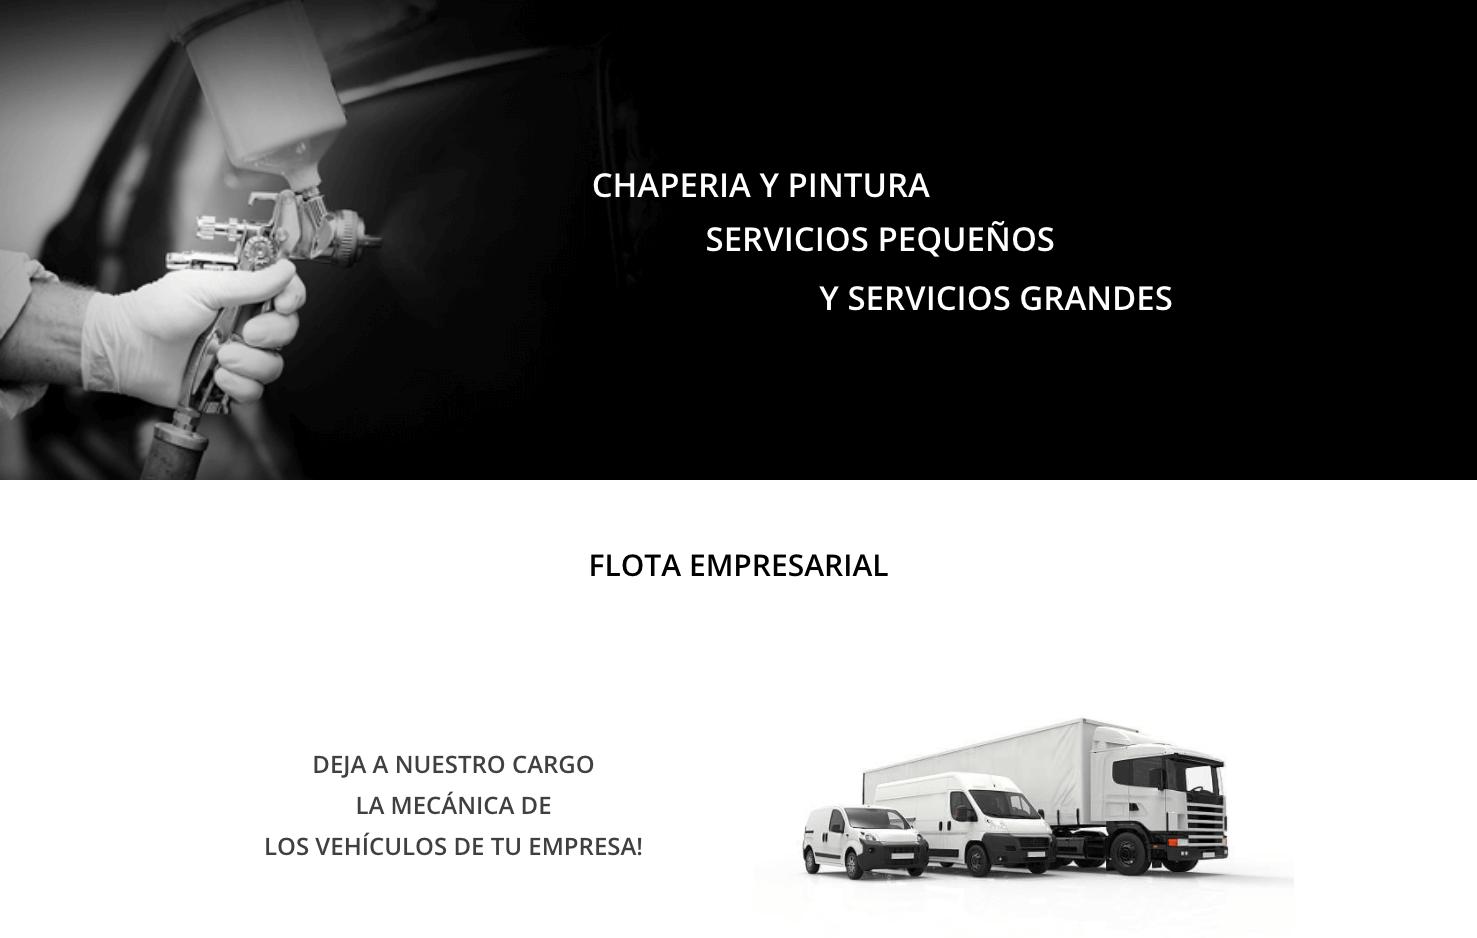 novo-site-del-rey-motors-pintura-automotiva-frota